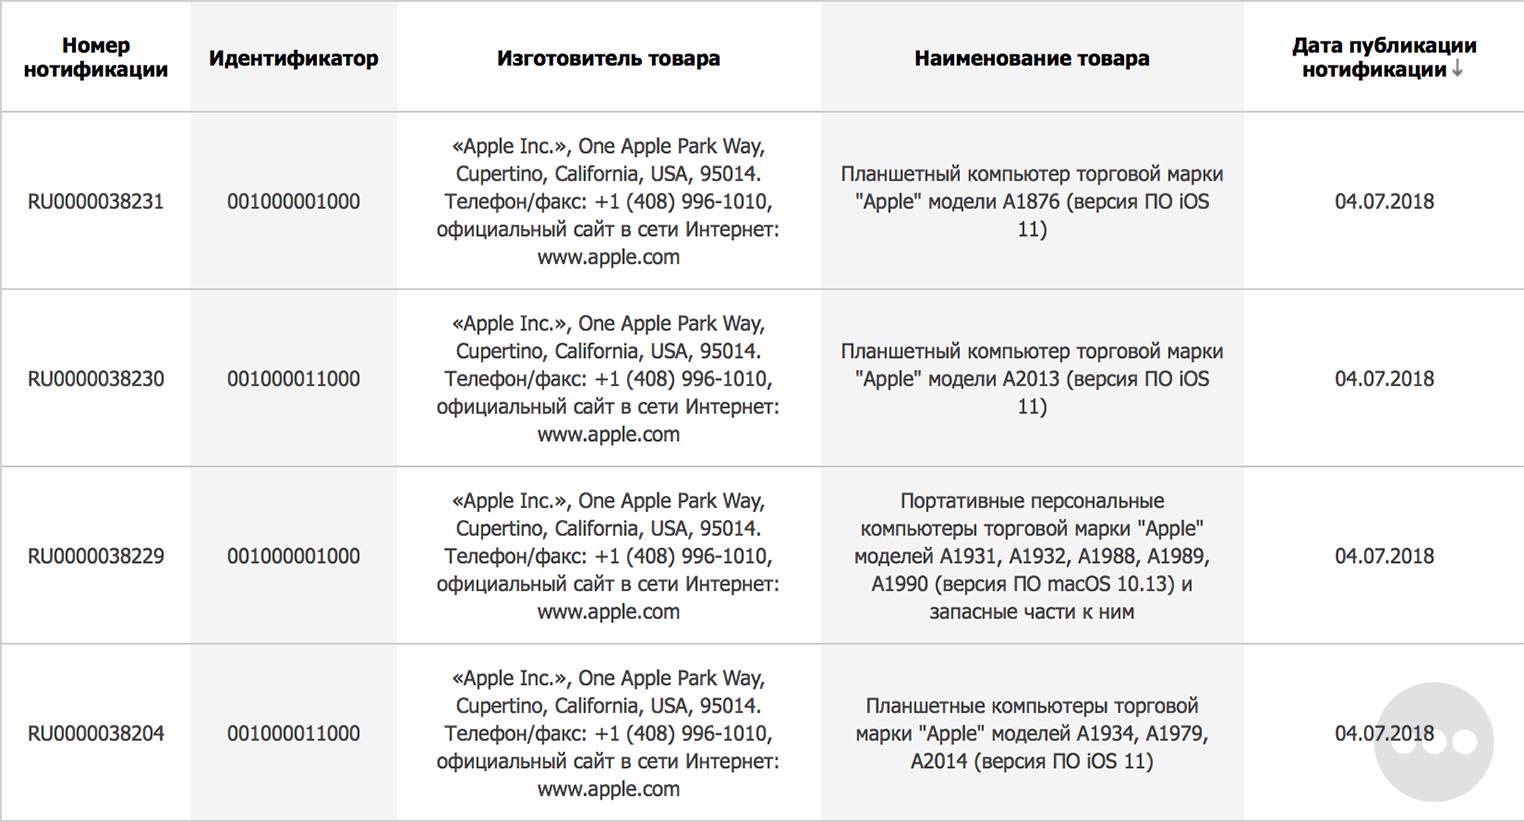 Nuovi Mac e nuovi iPad